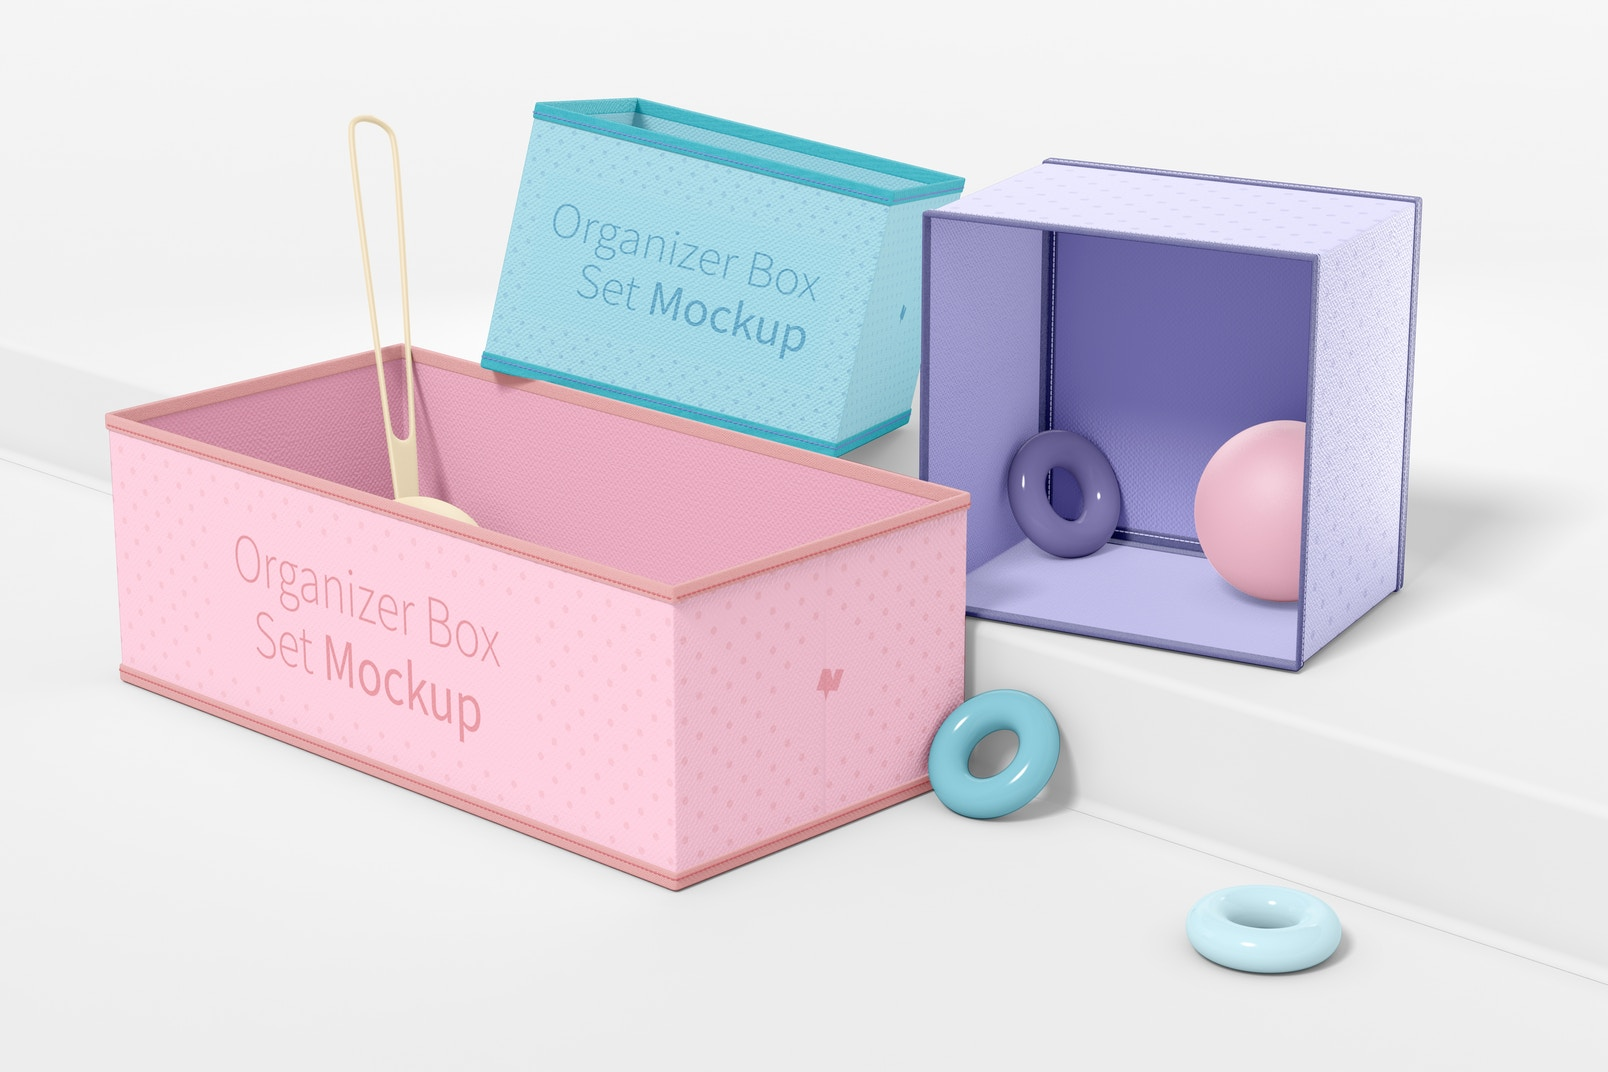 Fabric Organizer Box Set Mockup, Right View